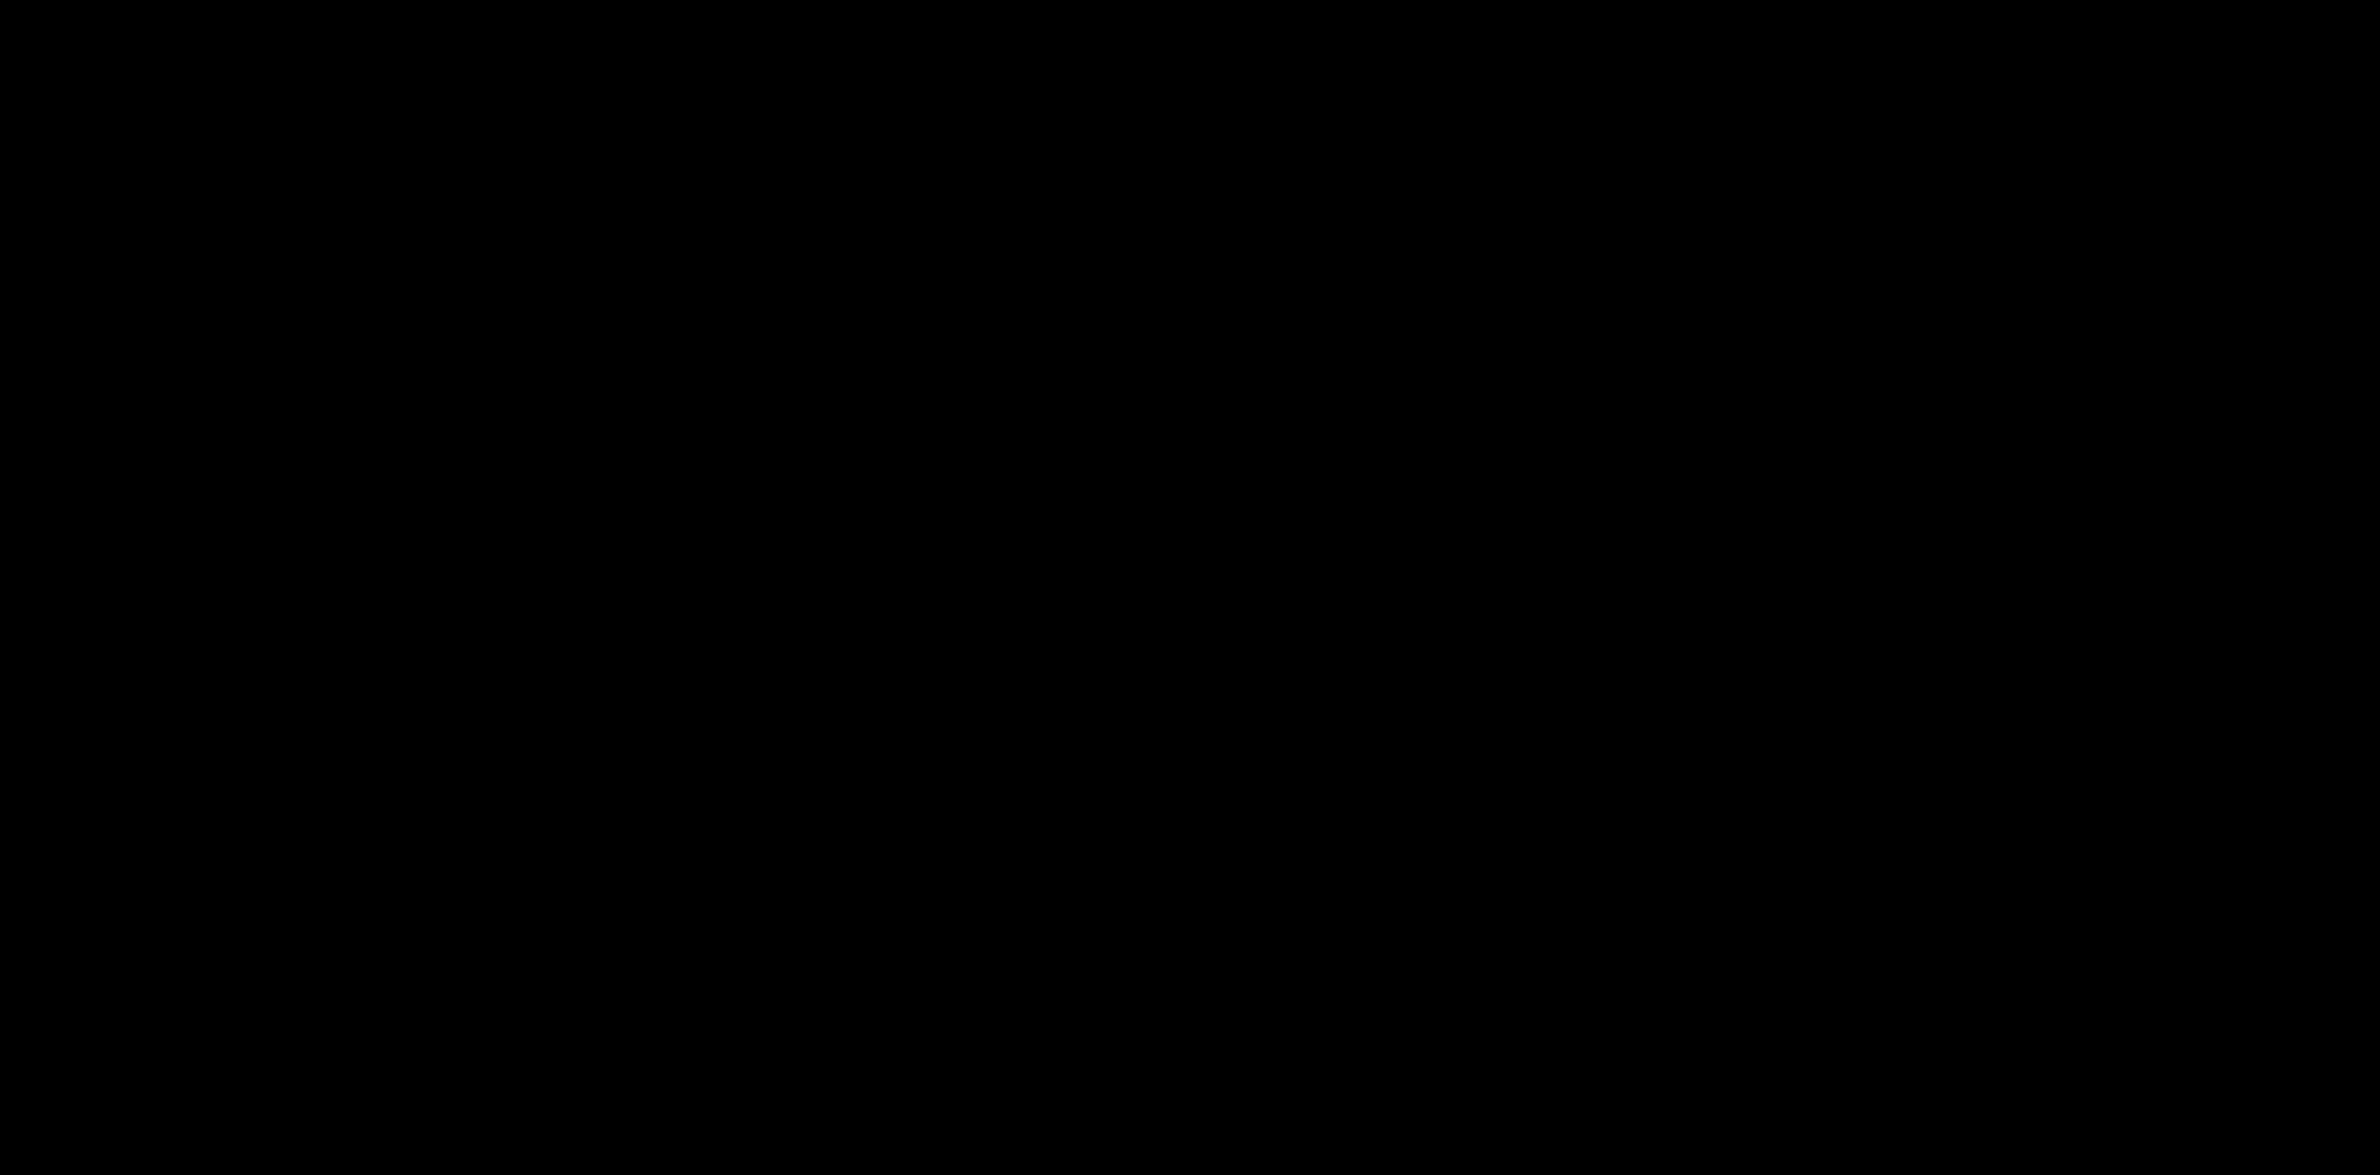 Bat clip art at. Clipart rat silhouette